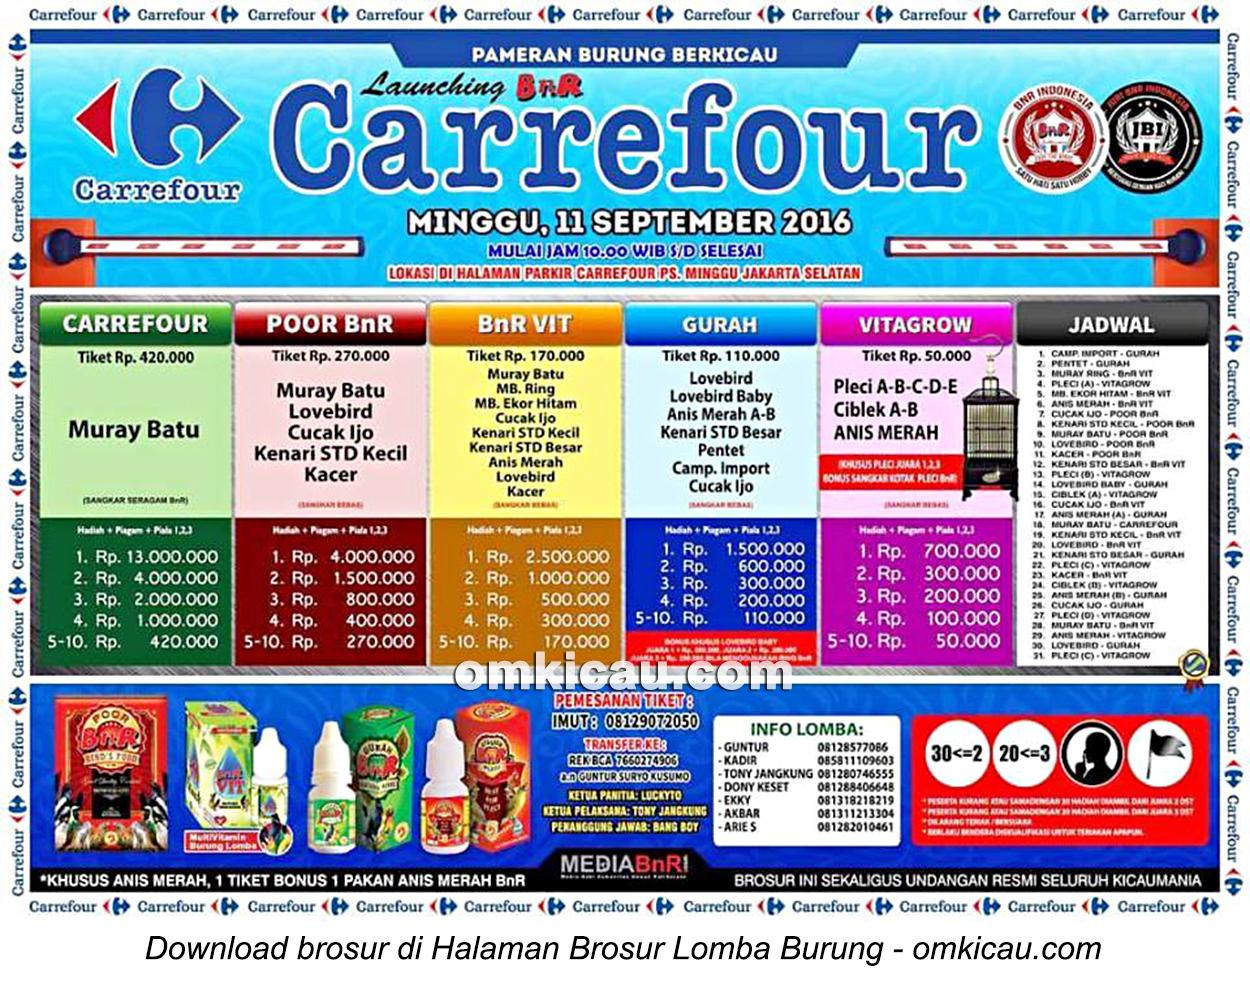 Brosur Lomba Burung Berkicau Launching BnR Carrefour, Jakarta Selatan, 11 September 2016